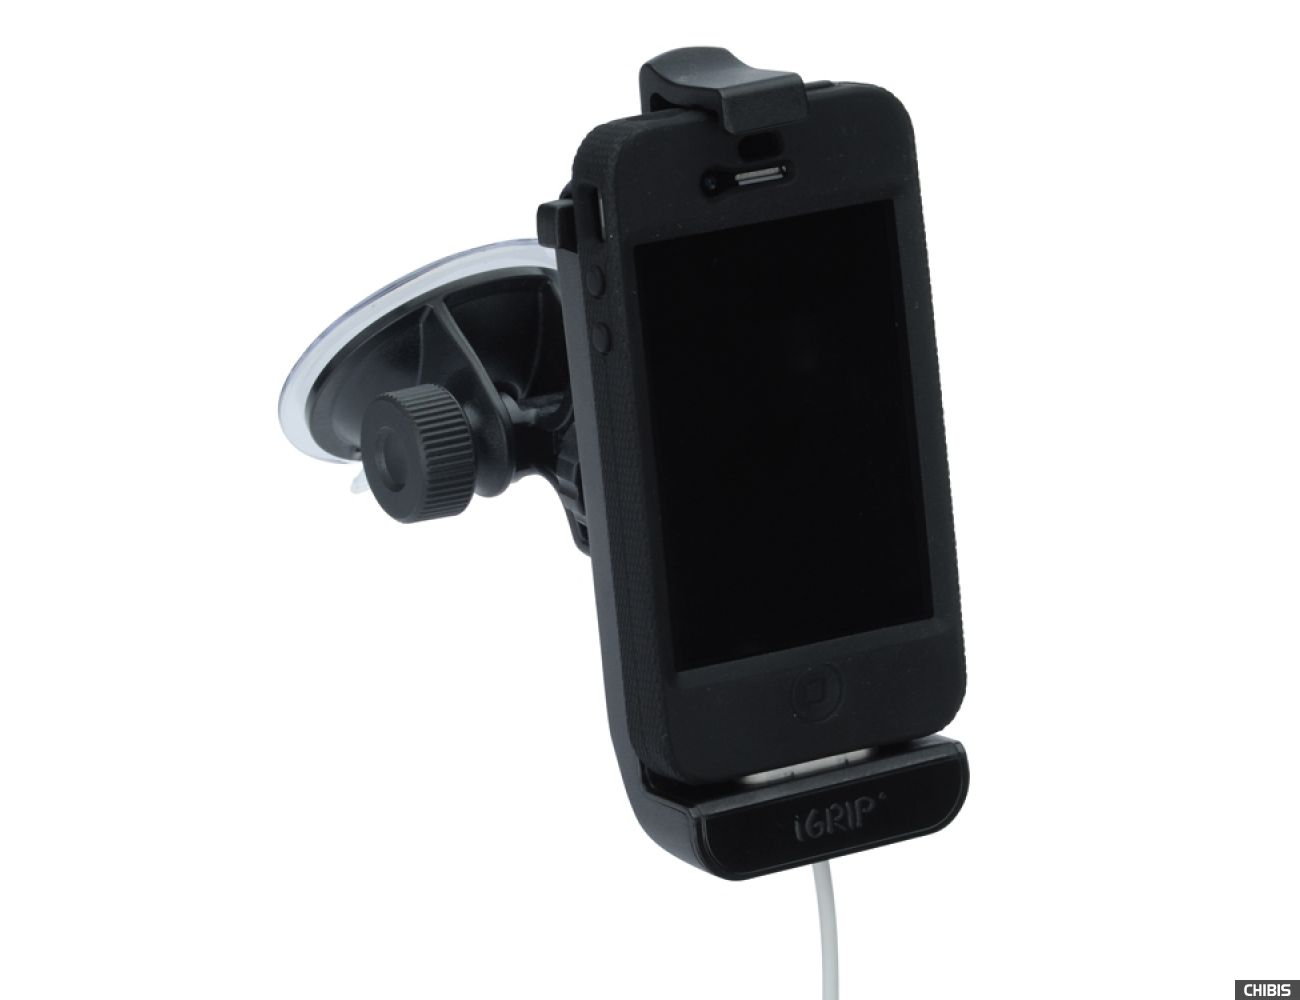 Автодержатель на стекло iGrip iPhone Dock Passive (T5-30410) для iPhone